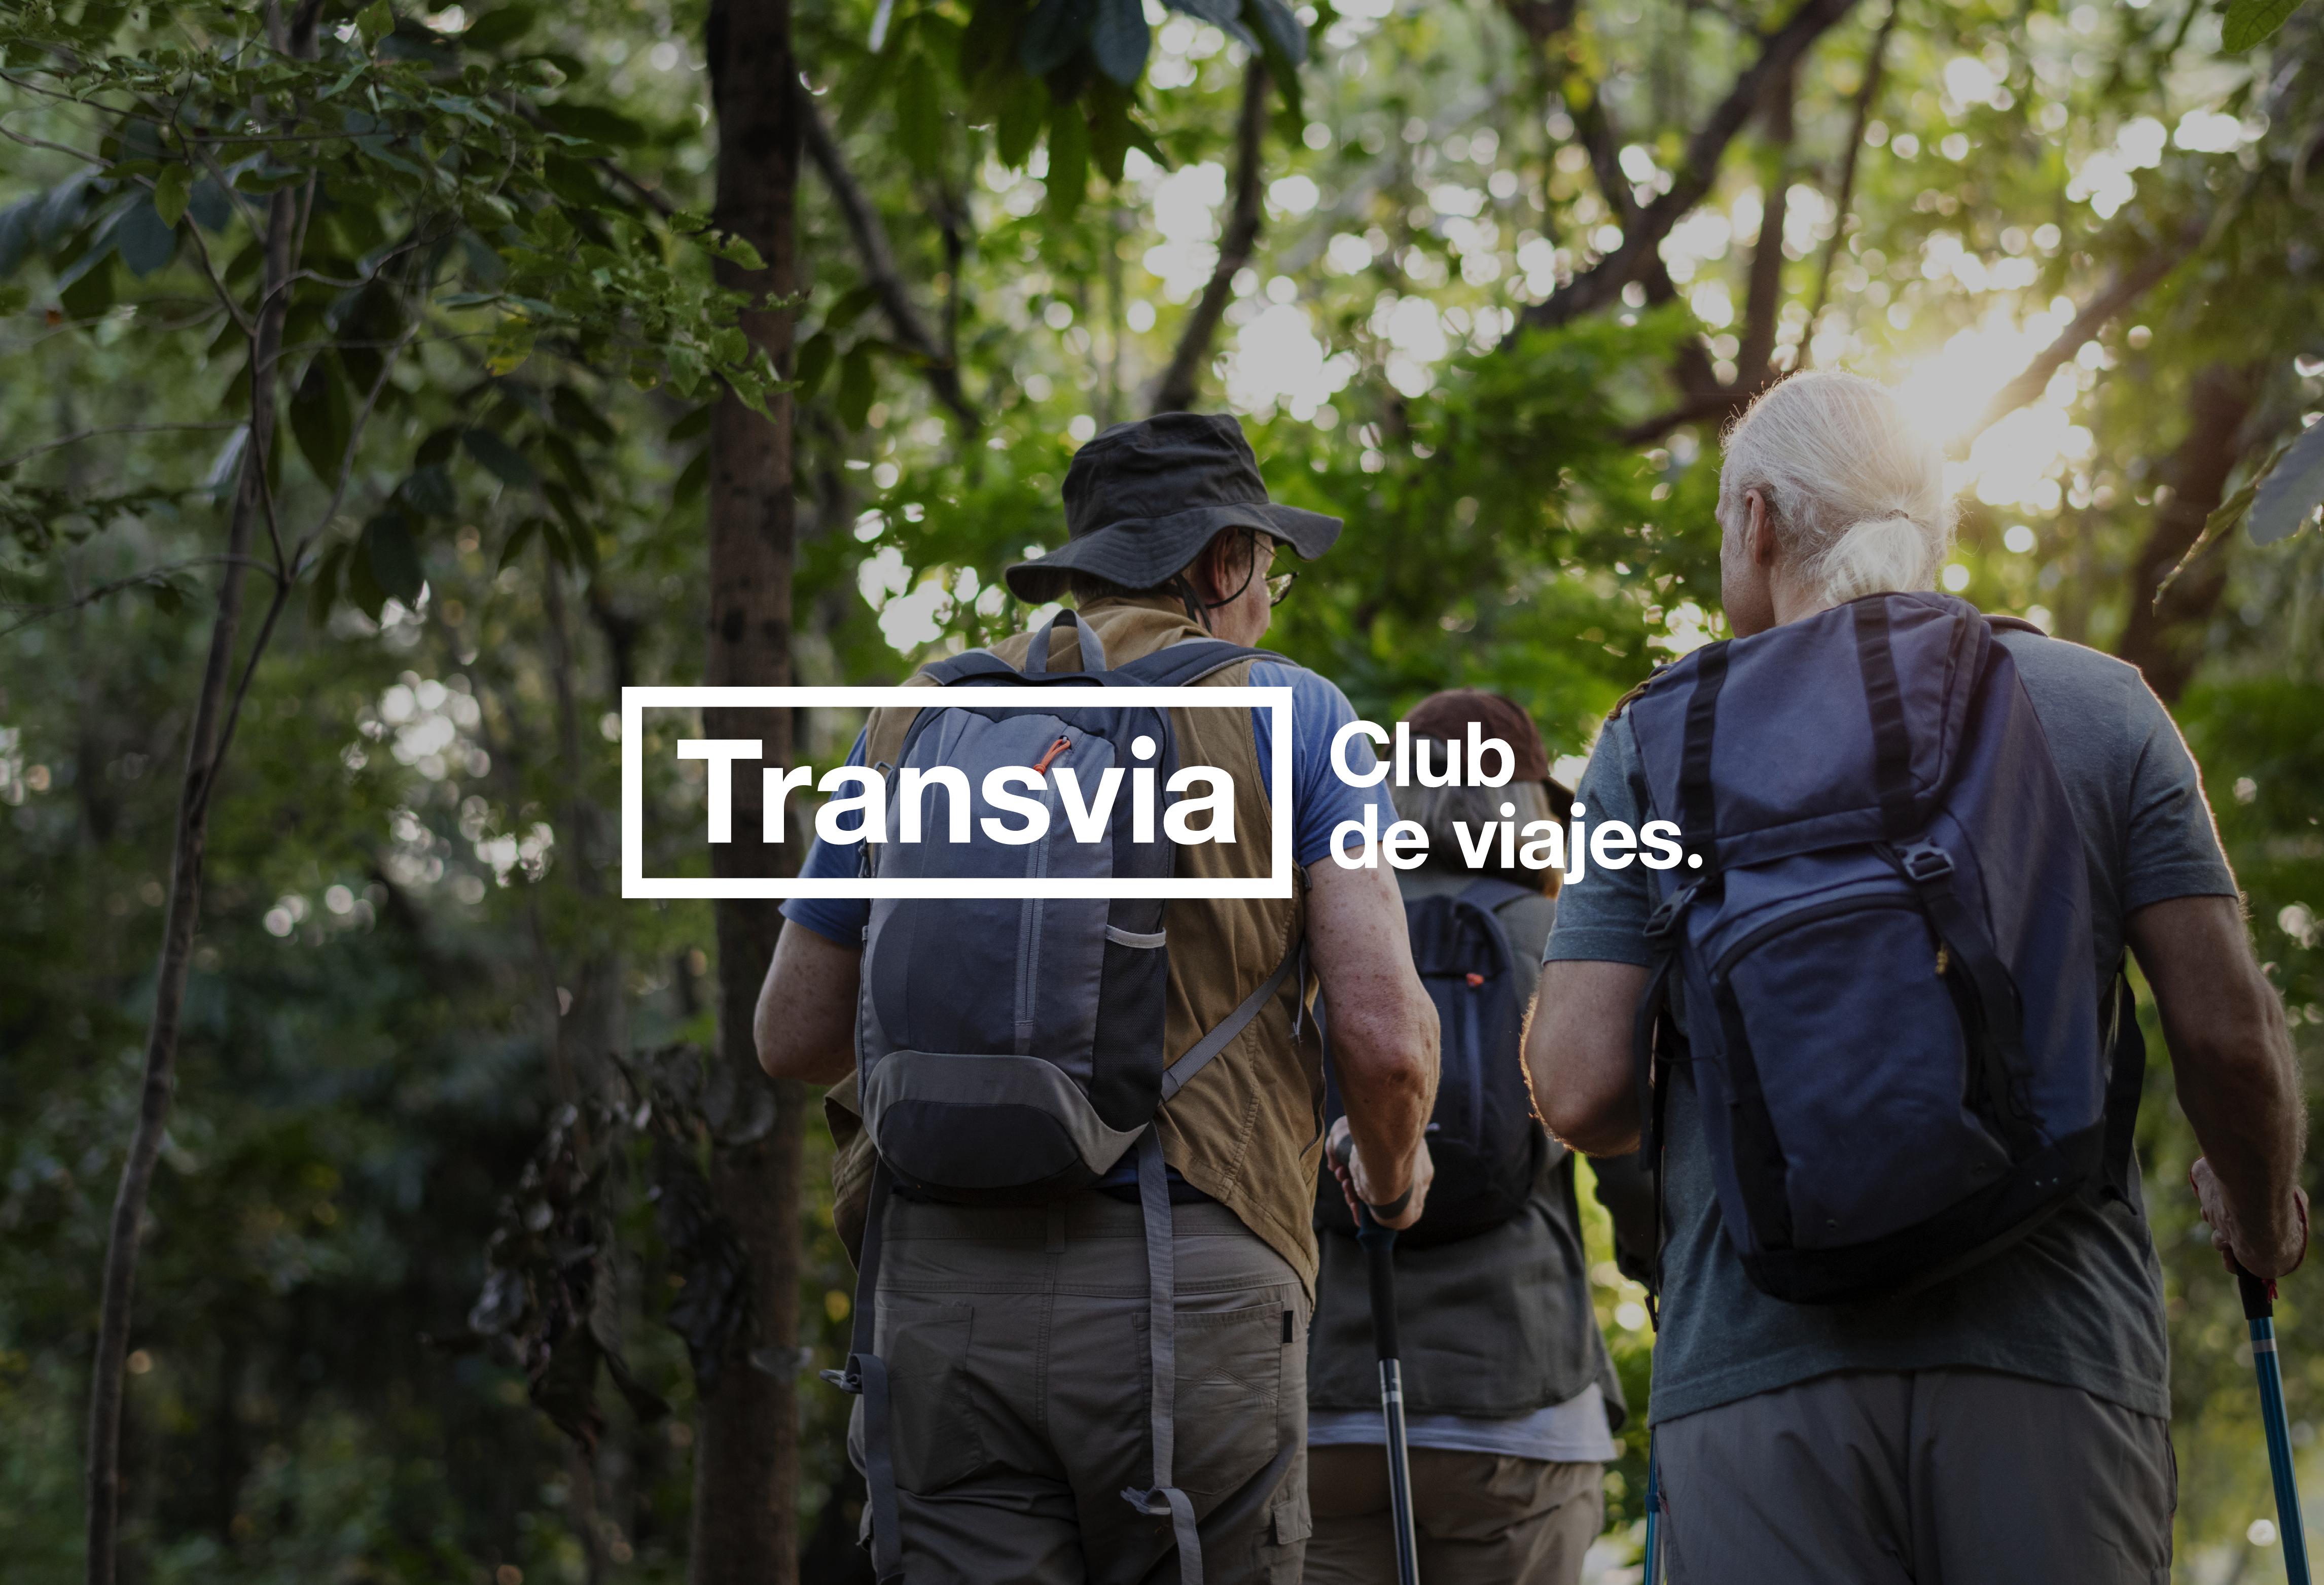 transvia club de viajes